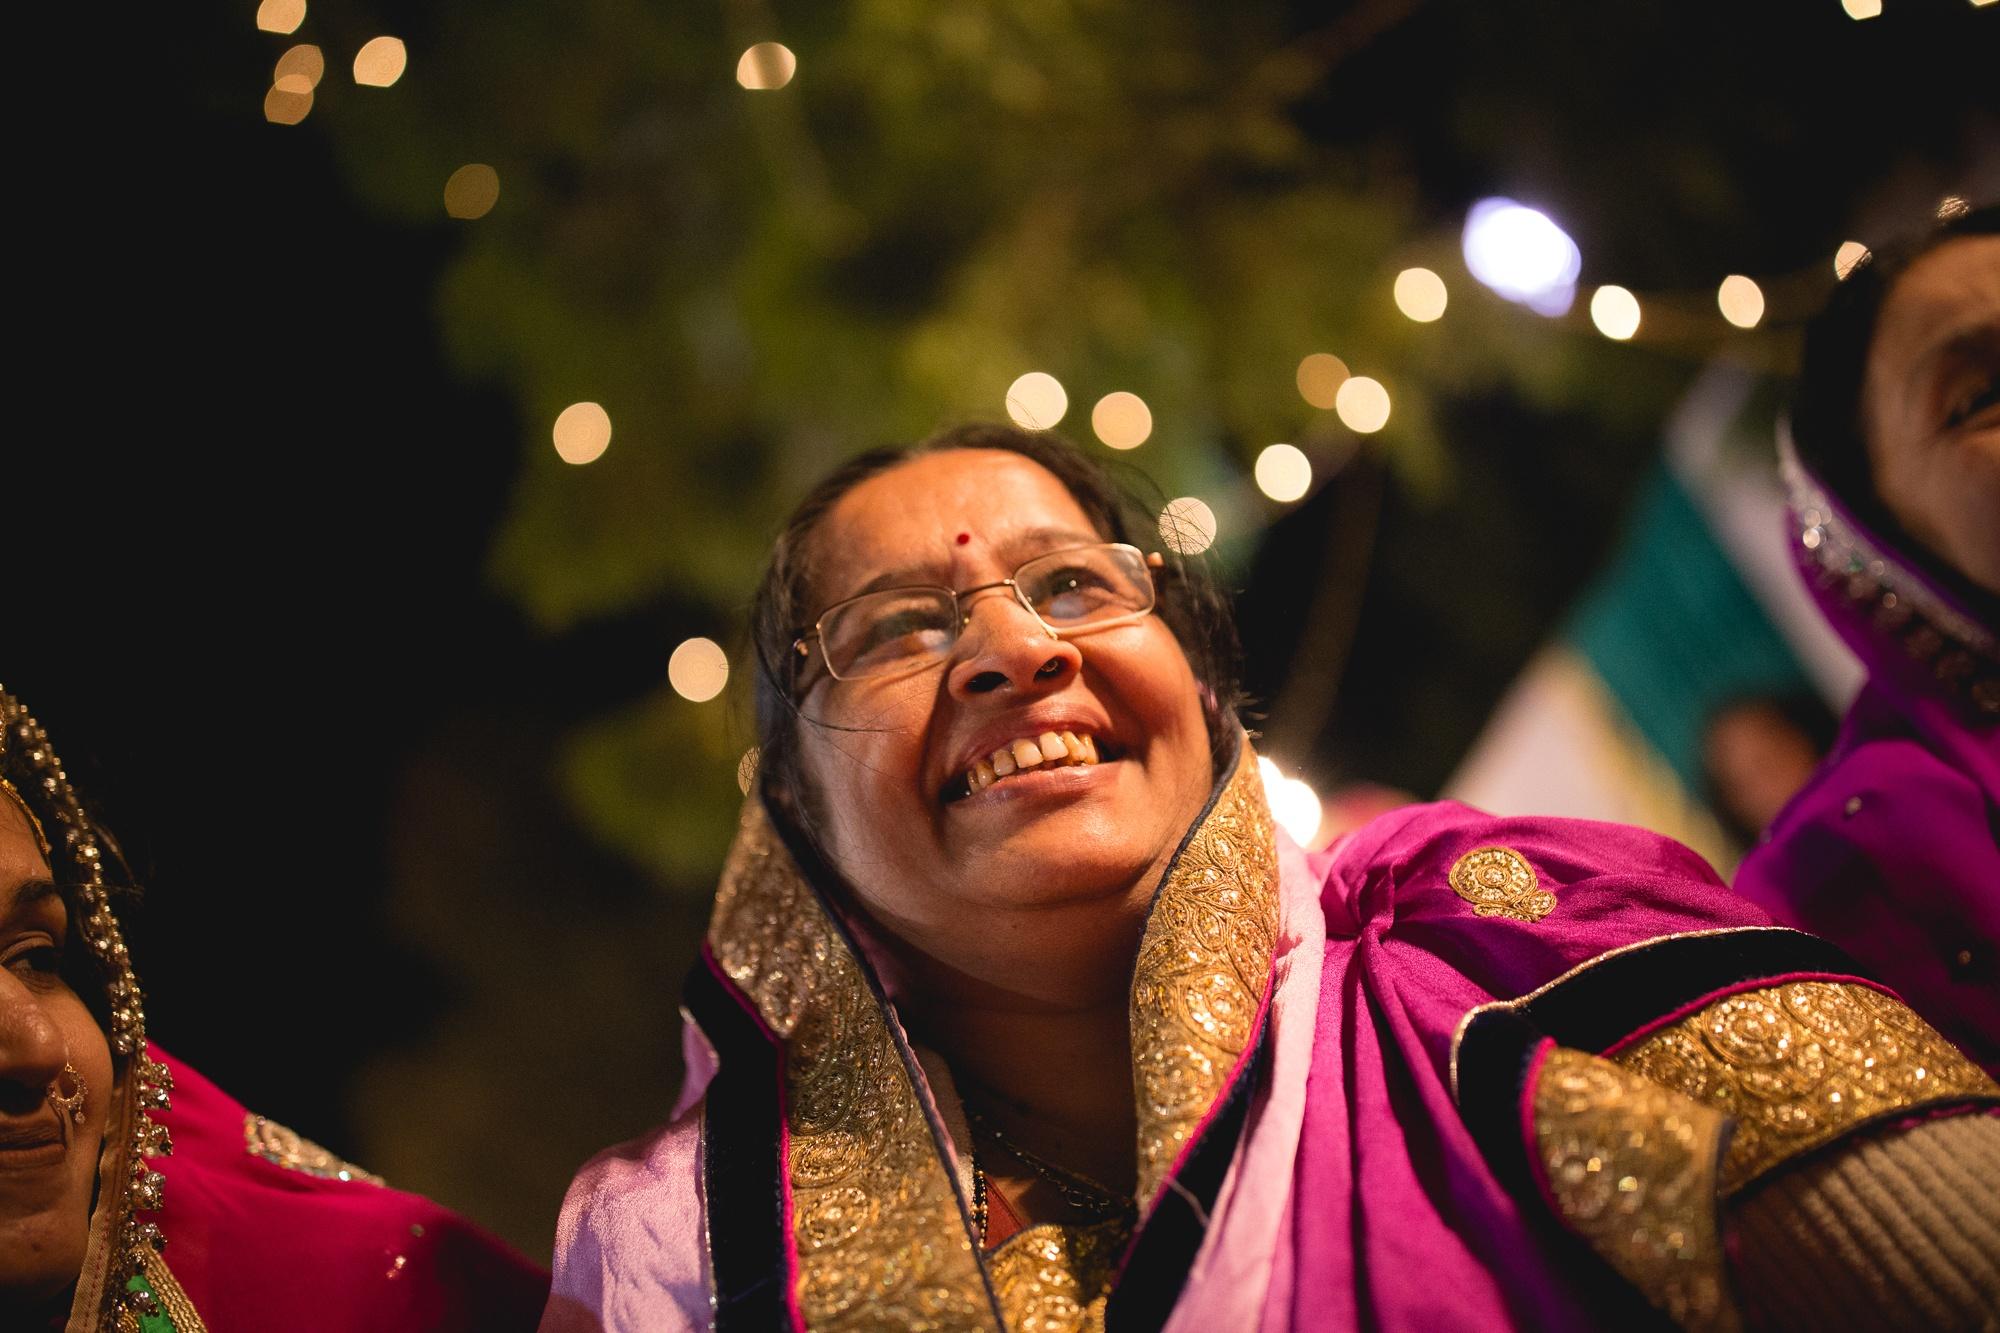 INDIA - ARGAZKI MAHATU, Photography & films.